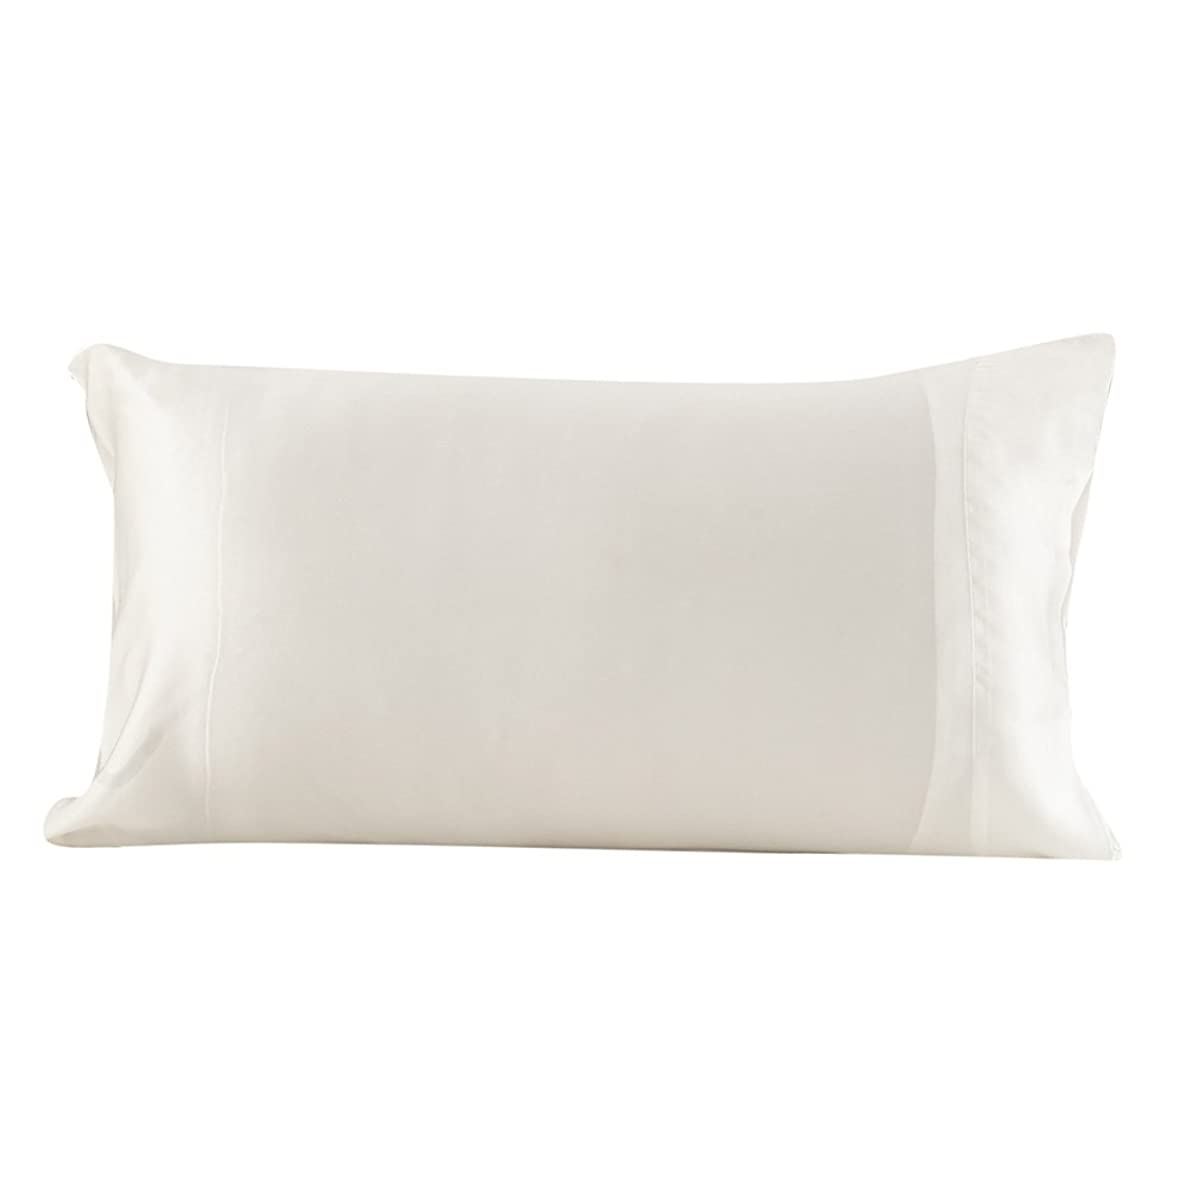 LilySilk UK1016-01-5075 100% Mulberry Silk Pillowcase Terse 22 Momme Queen 20